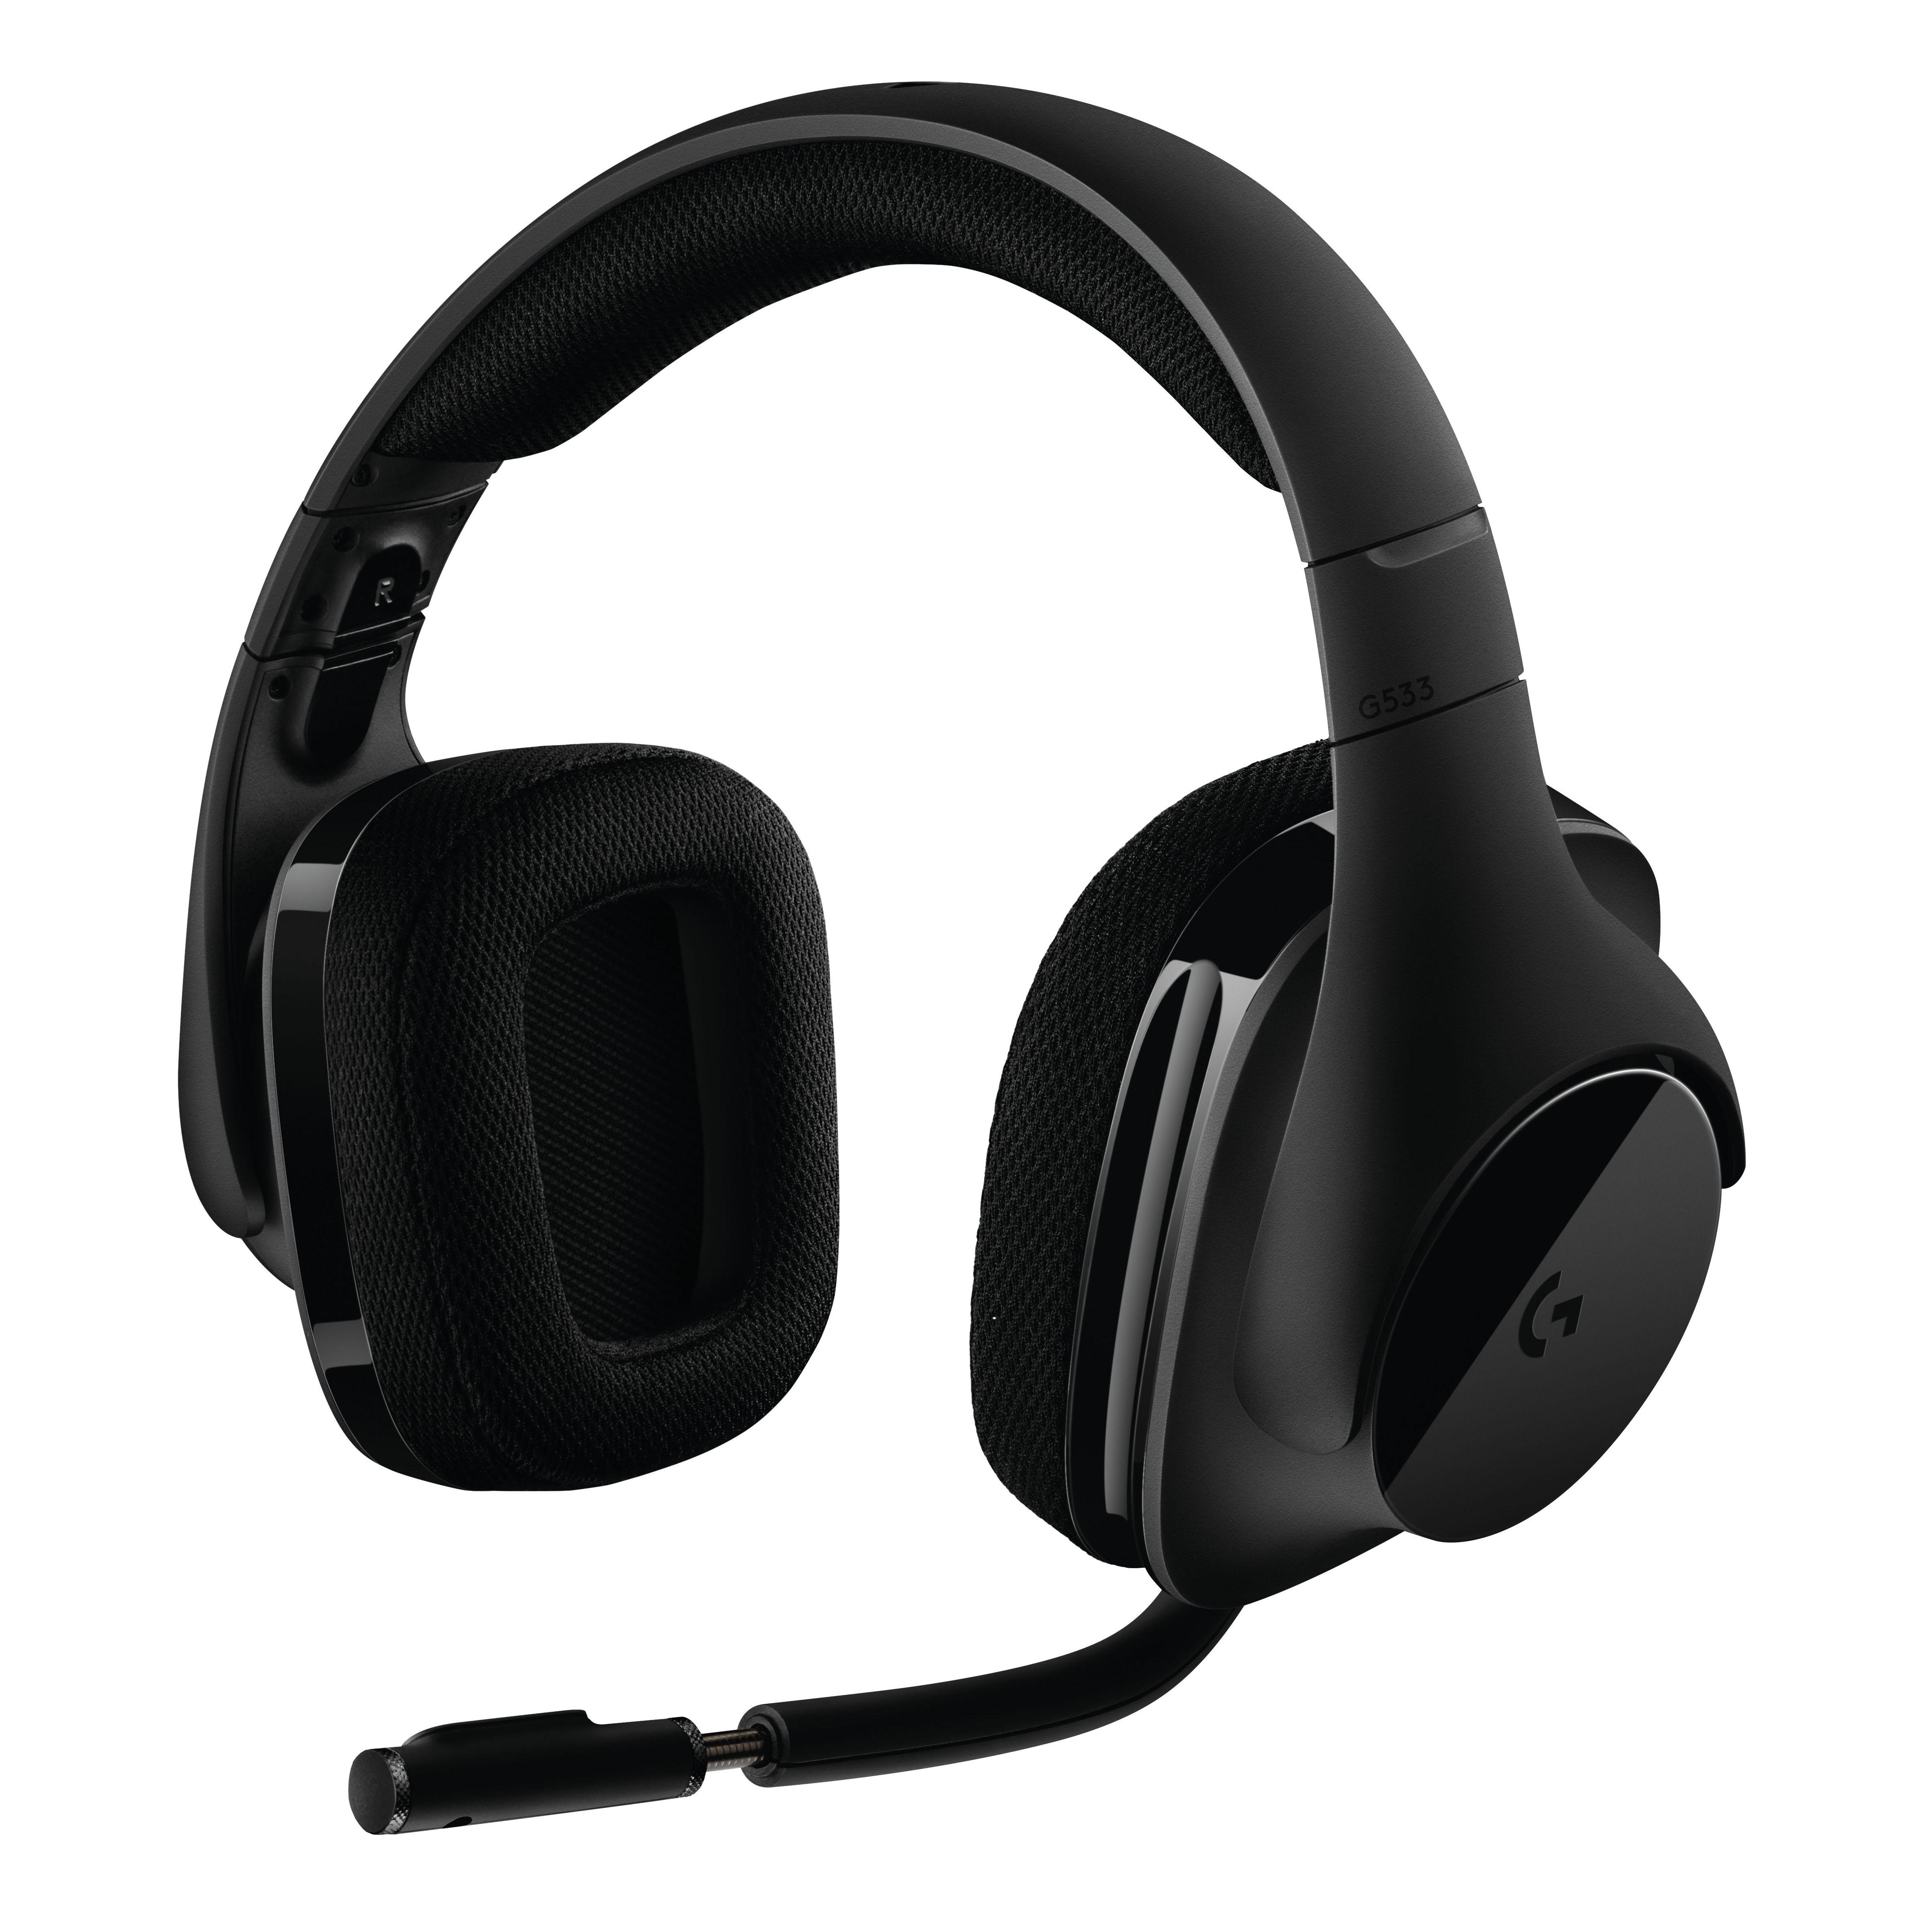 Casque-micro gamer sans fil Logitech G533 - Son Surround 7.1 DTS Headphone, Noir